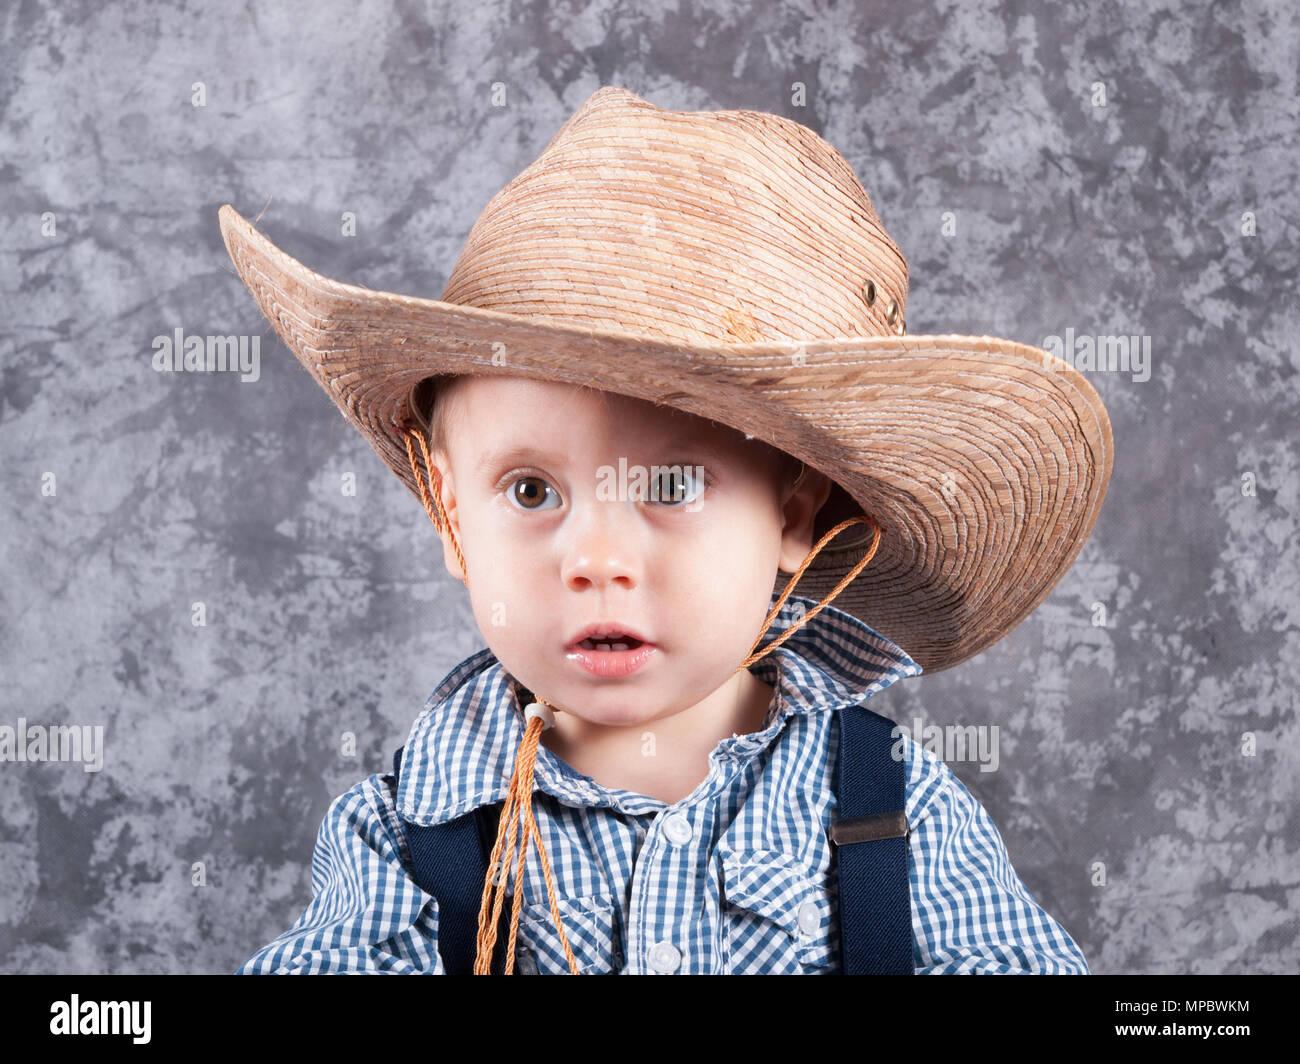 7b74788424bcd Little cute kid in cowboy straw hat Stock Photo  185887736 - Alamy